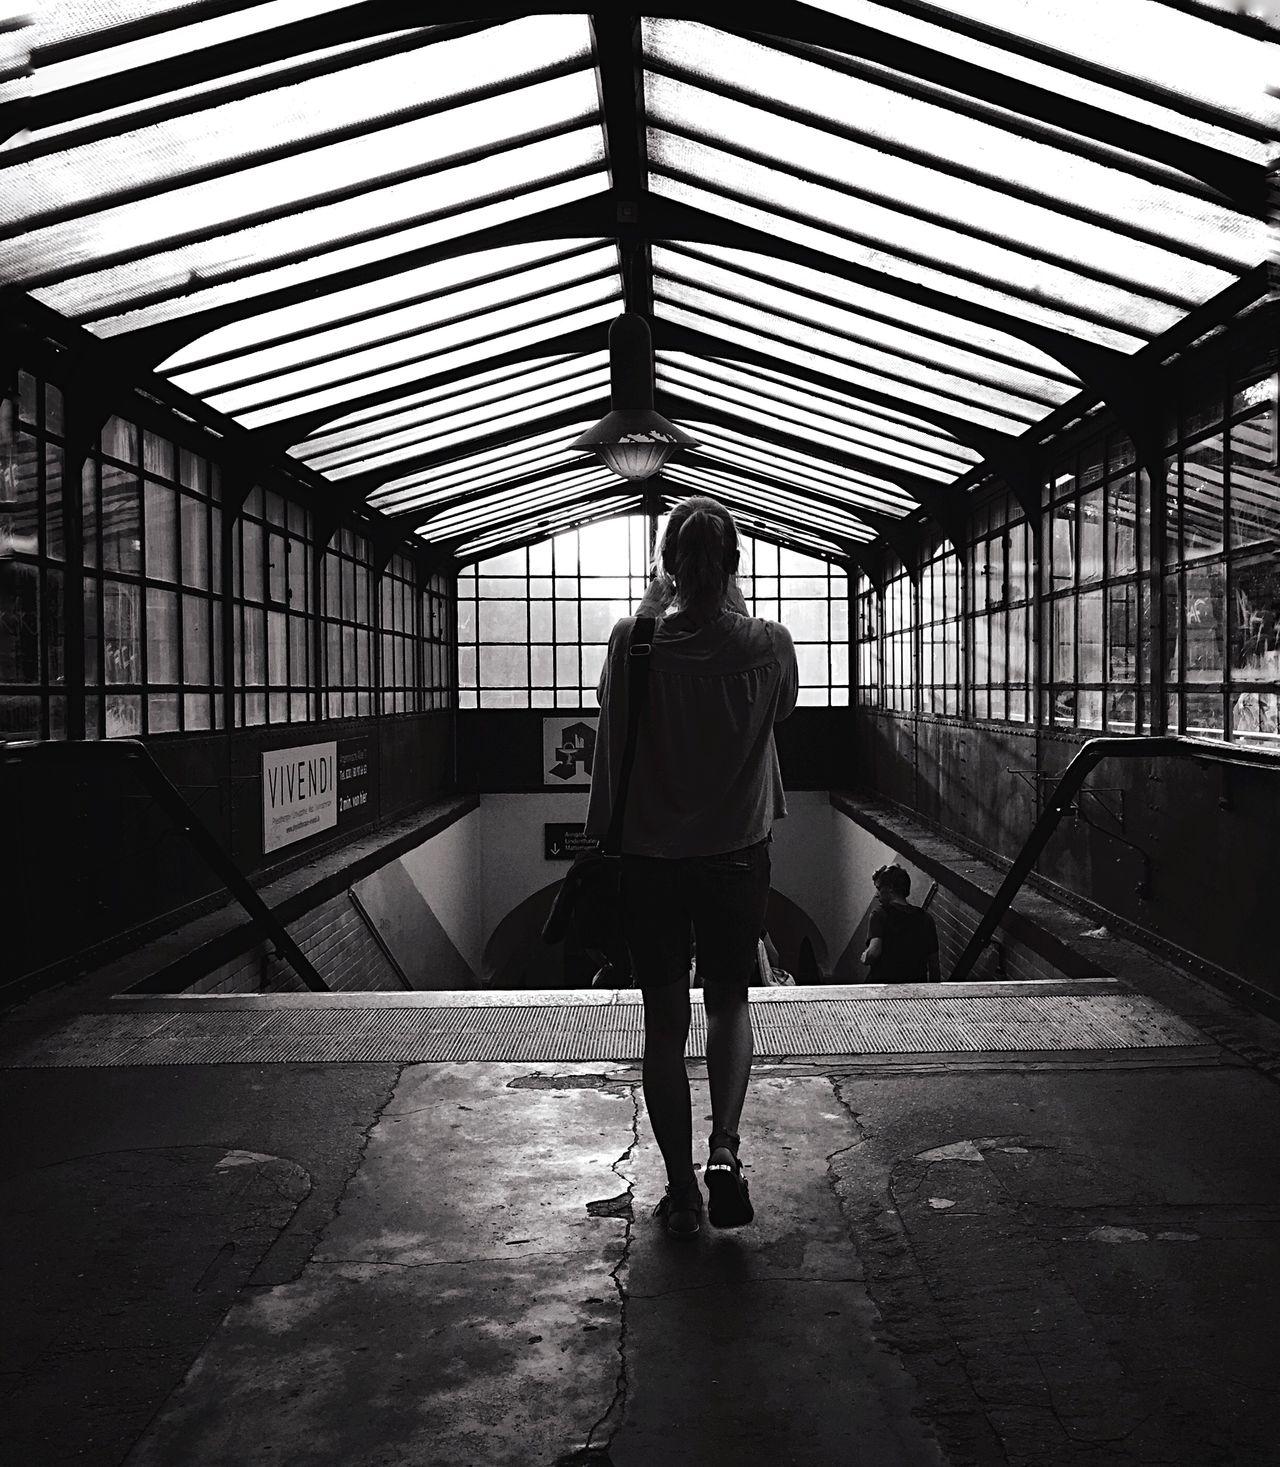 The Street Photographer - 2015 EyeEm Awards Streetphotography Berlin Mpro Blackandwhite Open Edit Mp_bundestag Shades Of Grey